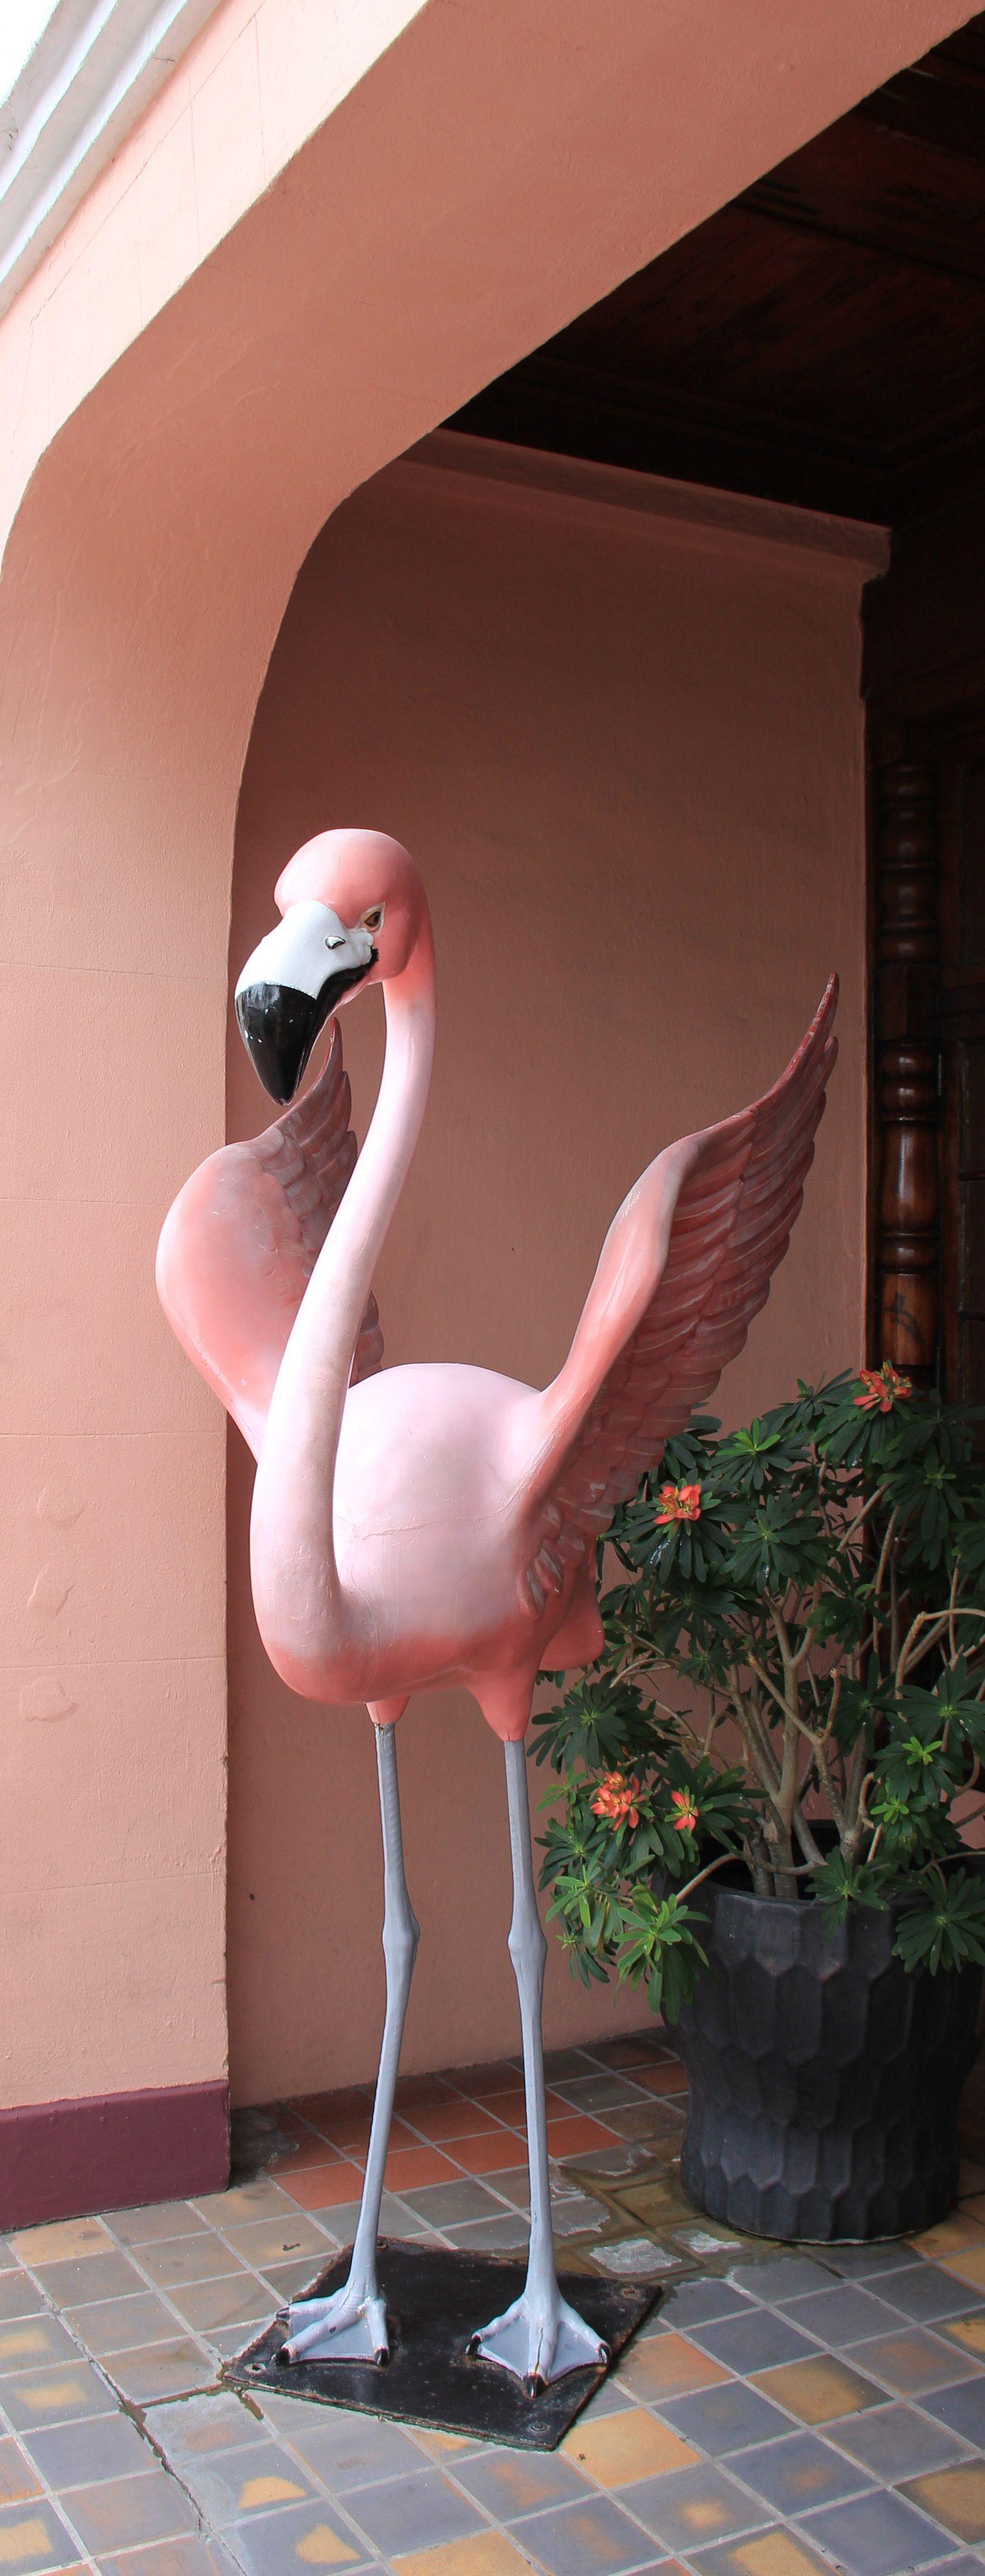 Pin By House Of Beccaria On Florida Usa Miami Art Deco Flamingo Art Fancy Flamingo